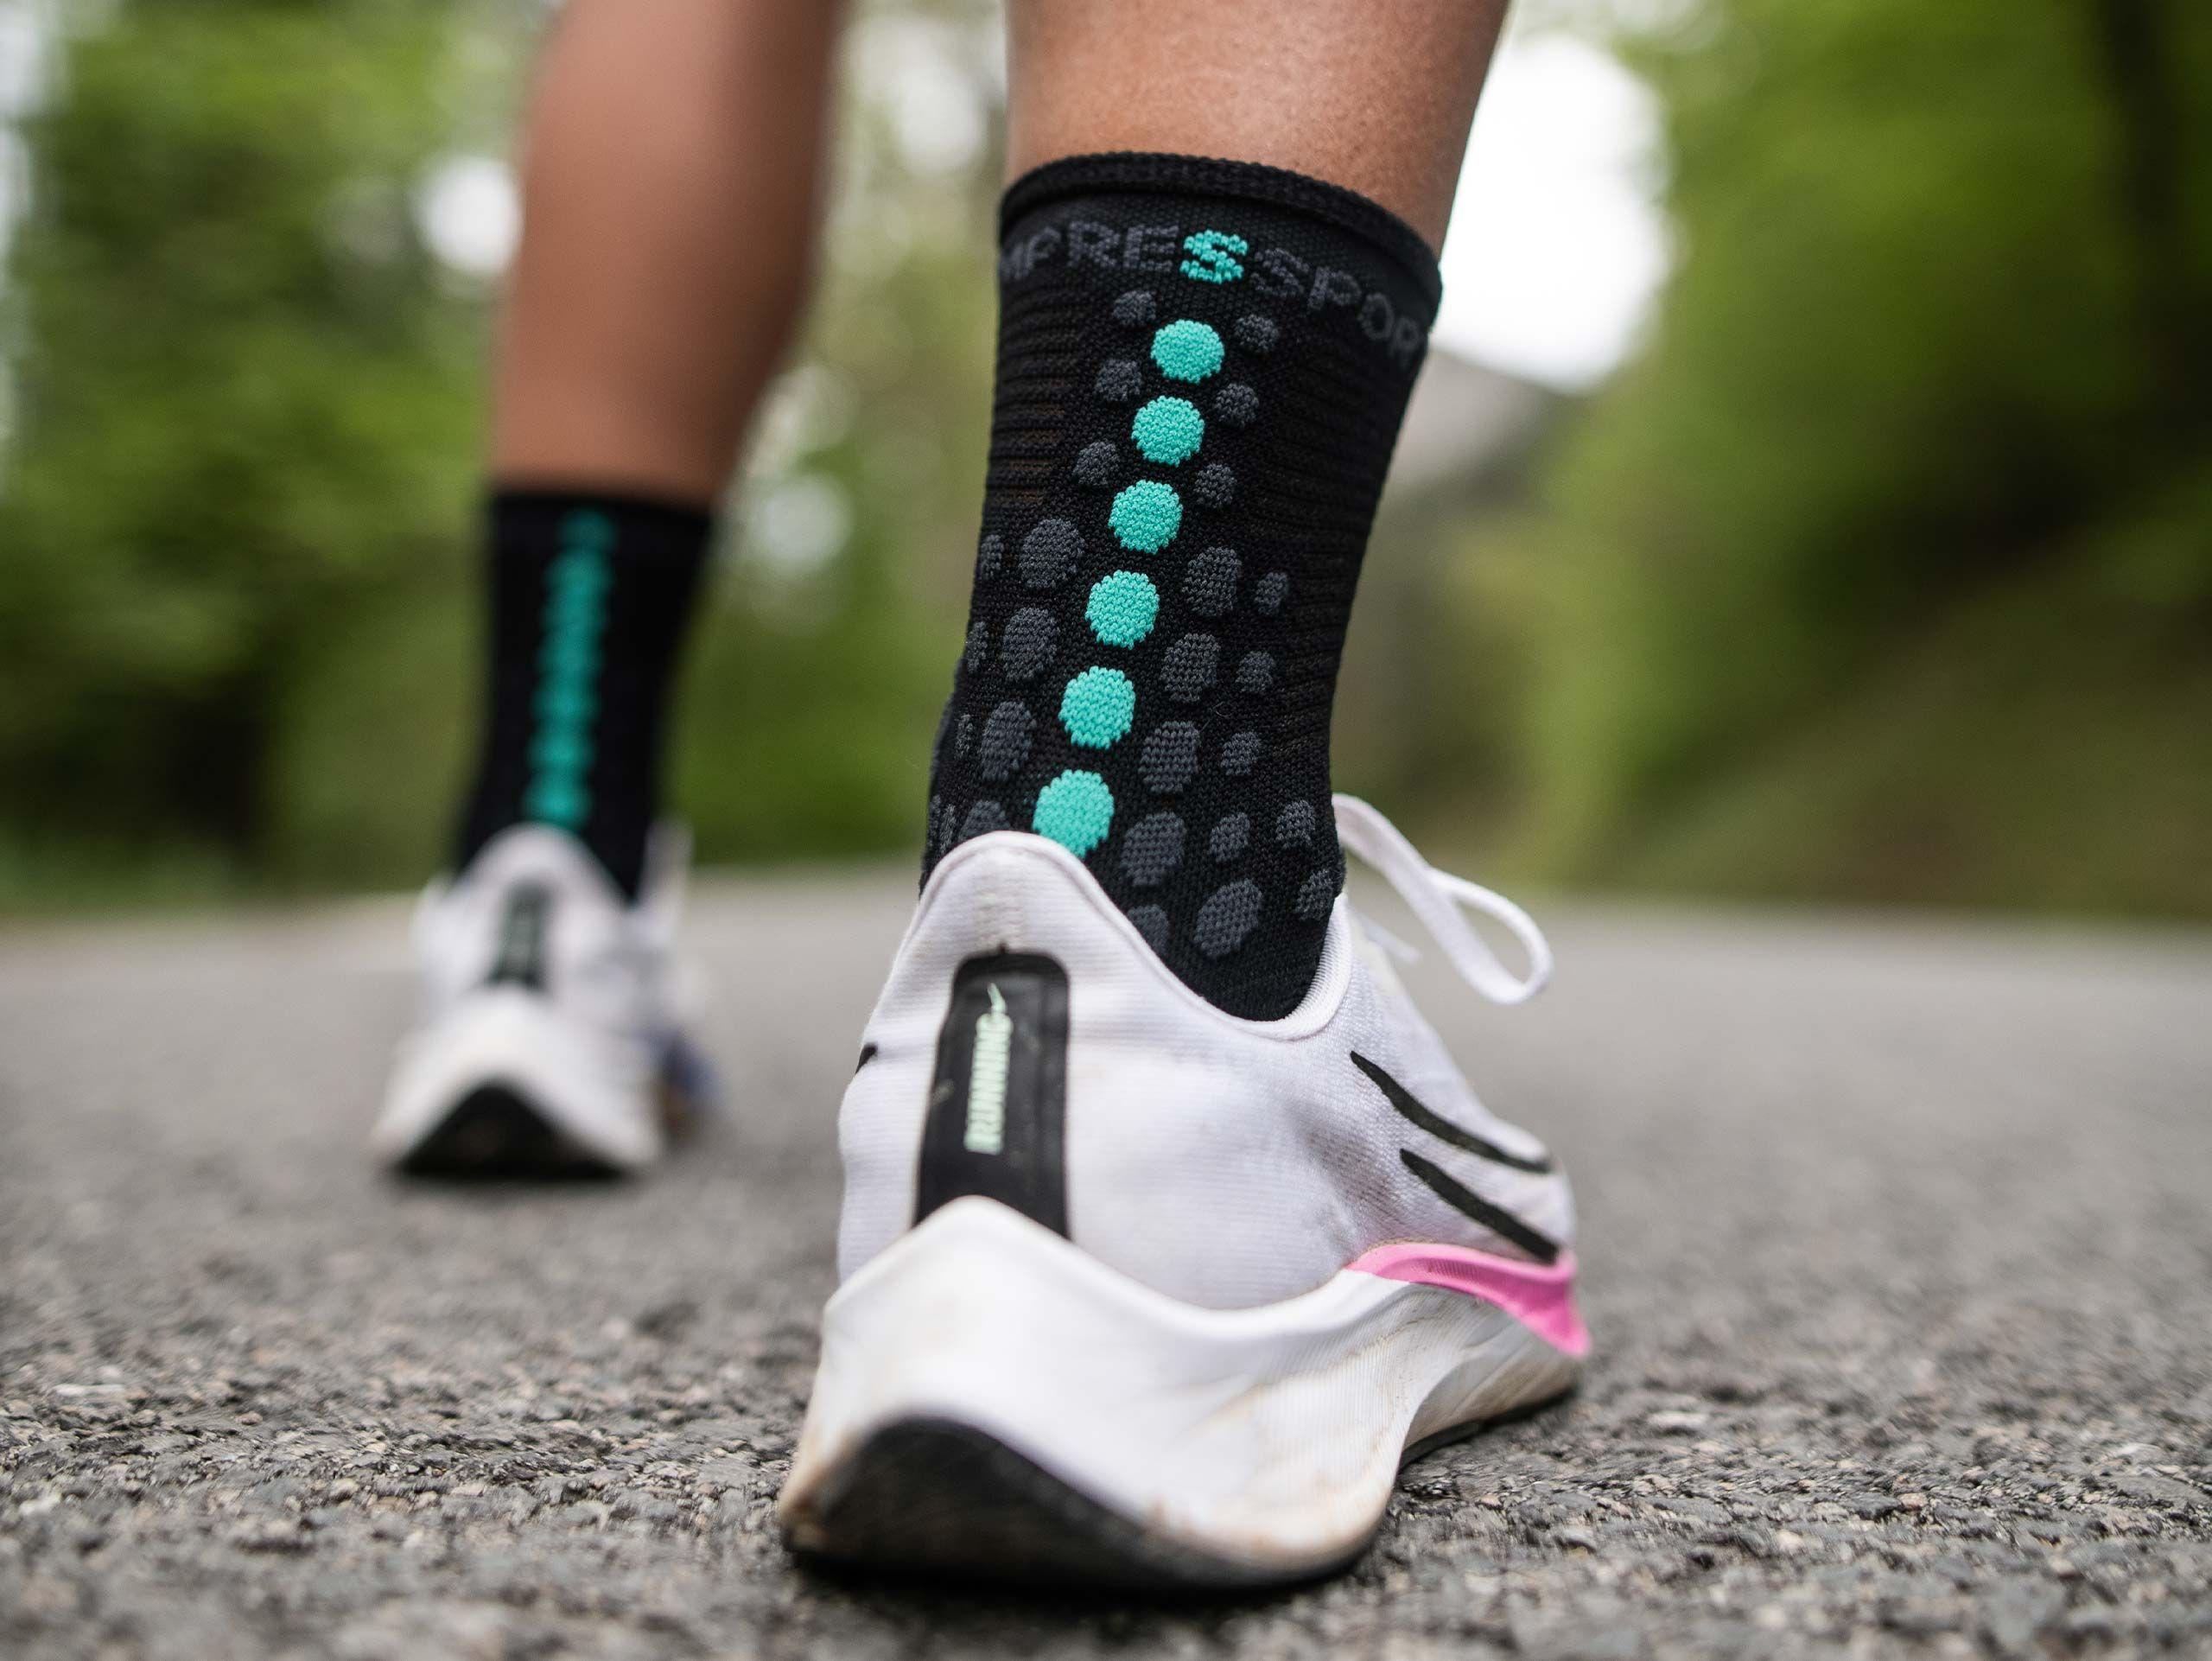 Pro Racing Socks v3.0 Run High - Black Edition 2021